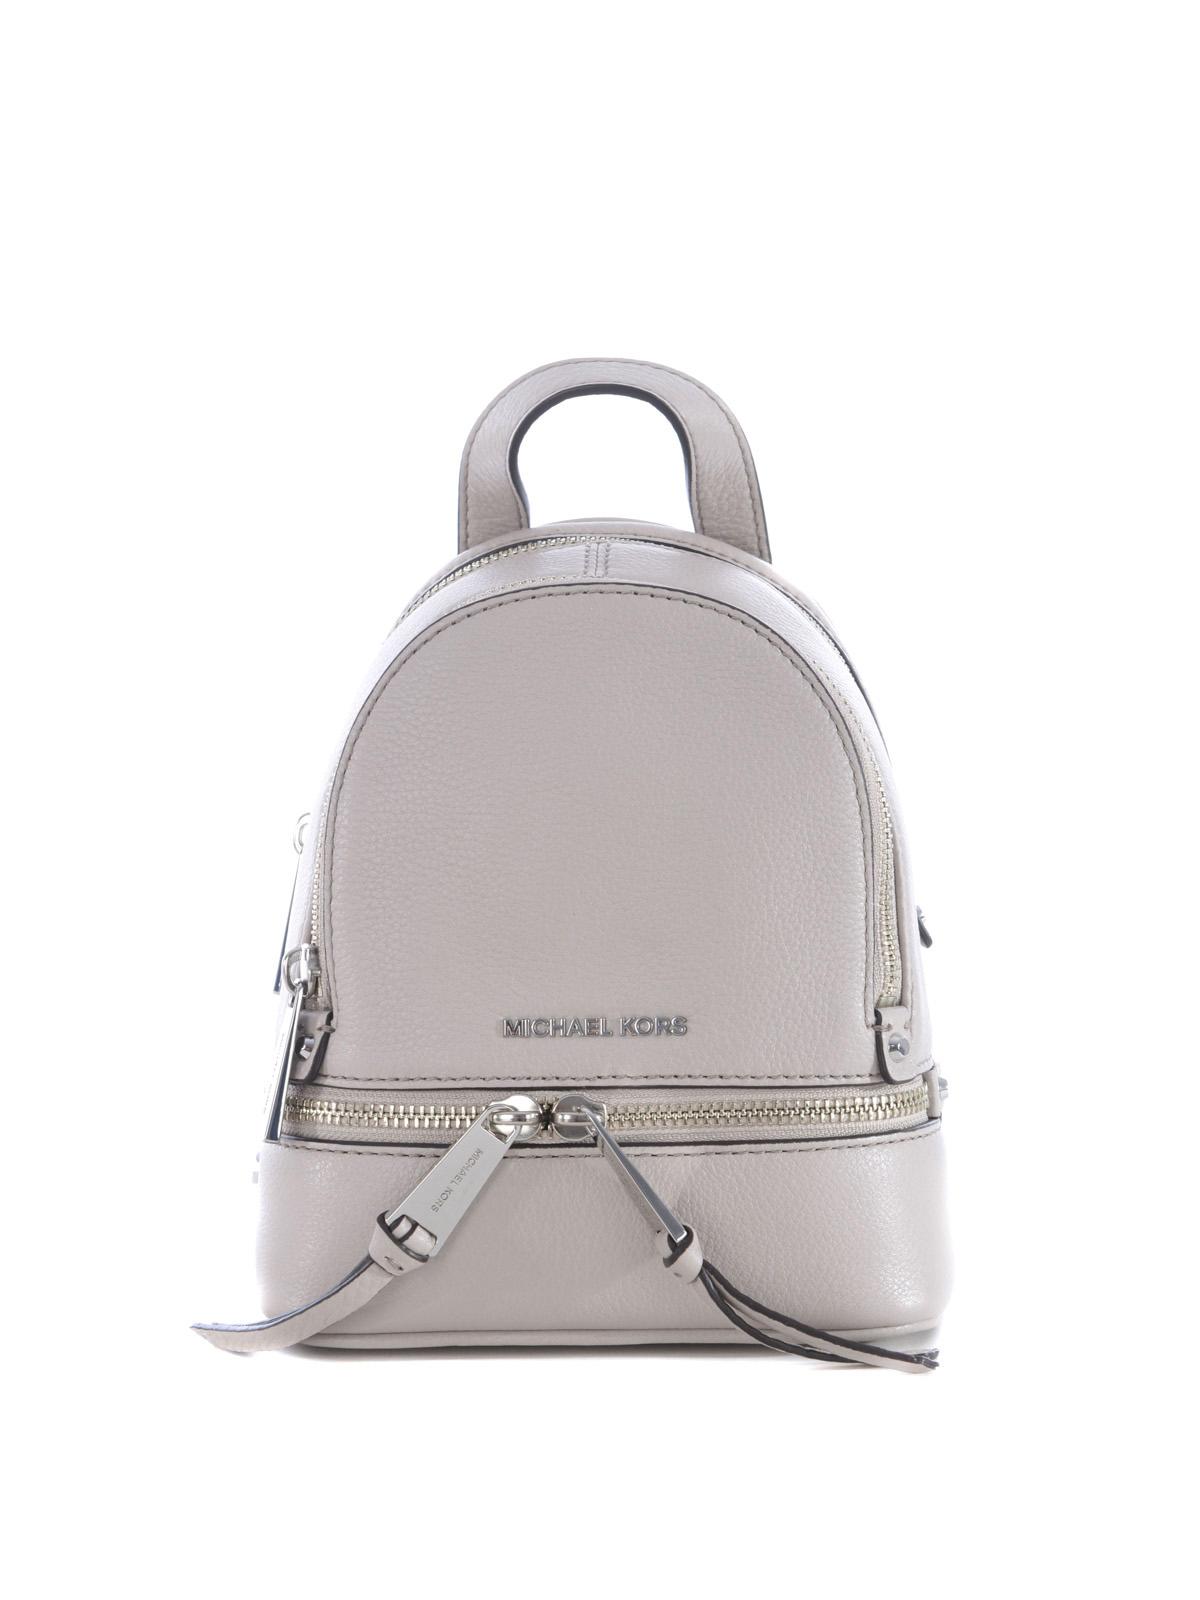 2e7b3be79ce8d wholesale michael kors backpack rhea extra small 946ce c6cb0